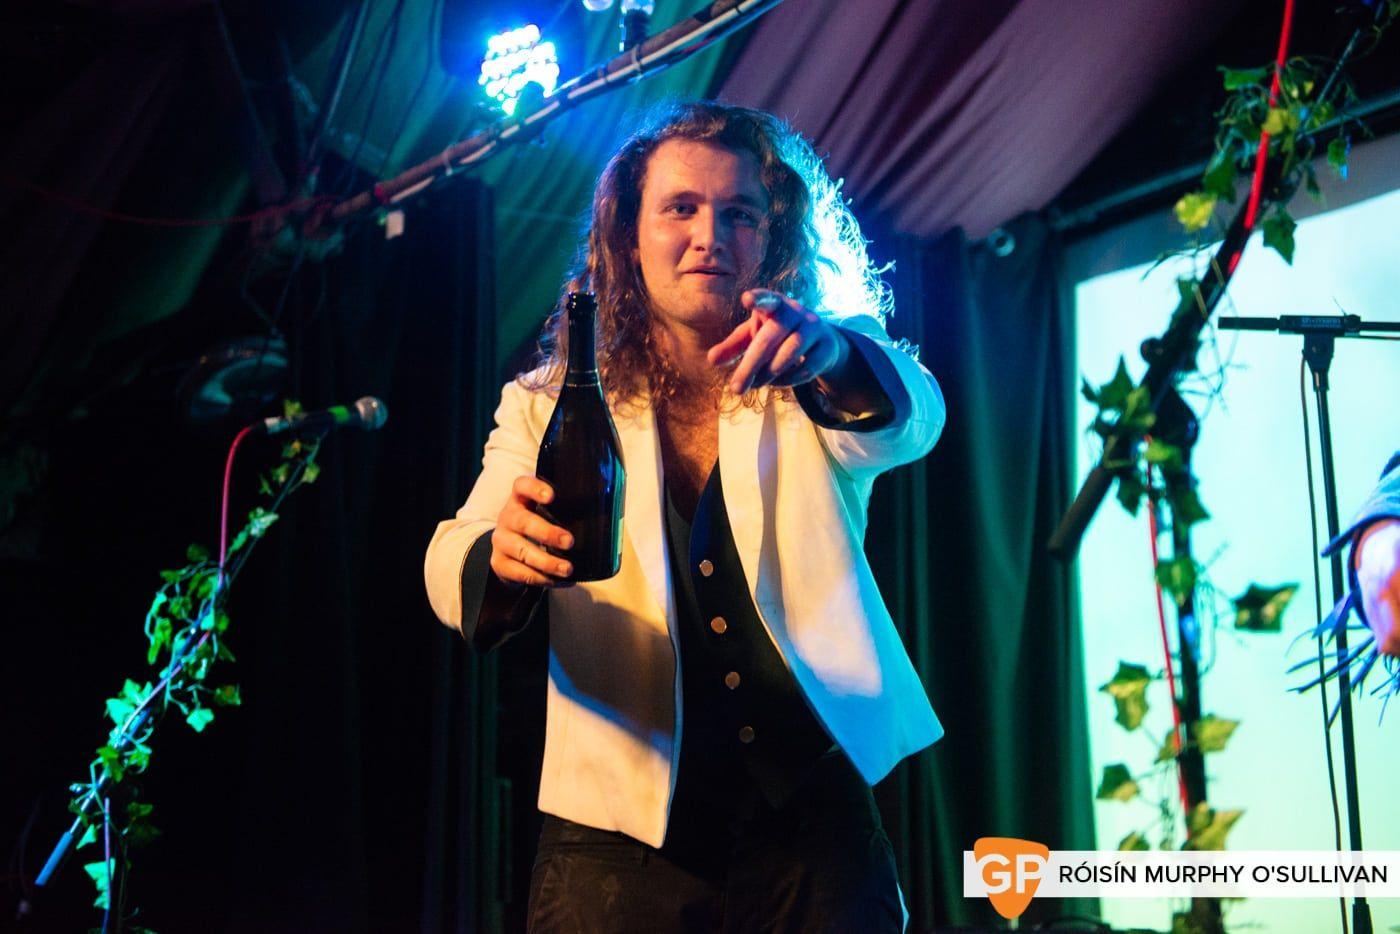 Hunkpapa at The Grand Social HWCH by Roisin Murphy O'Sullivan (11 of 14)